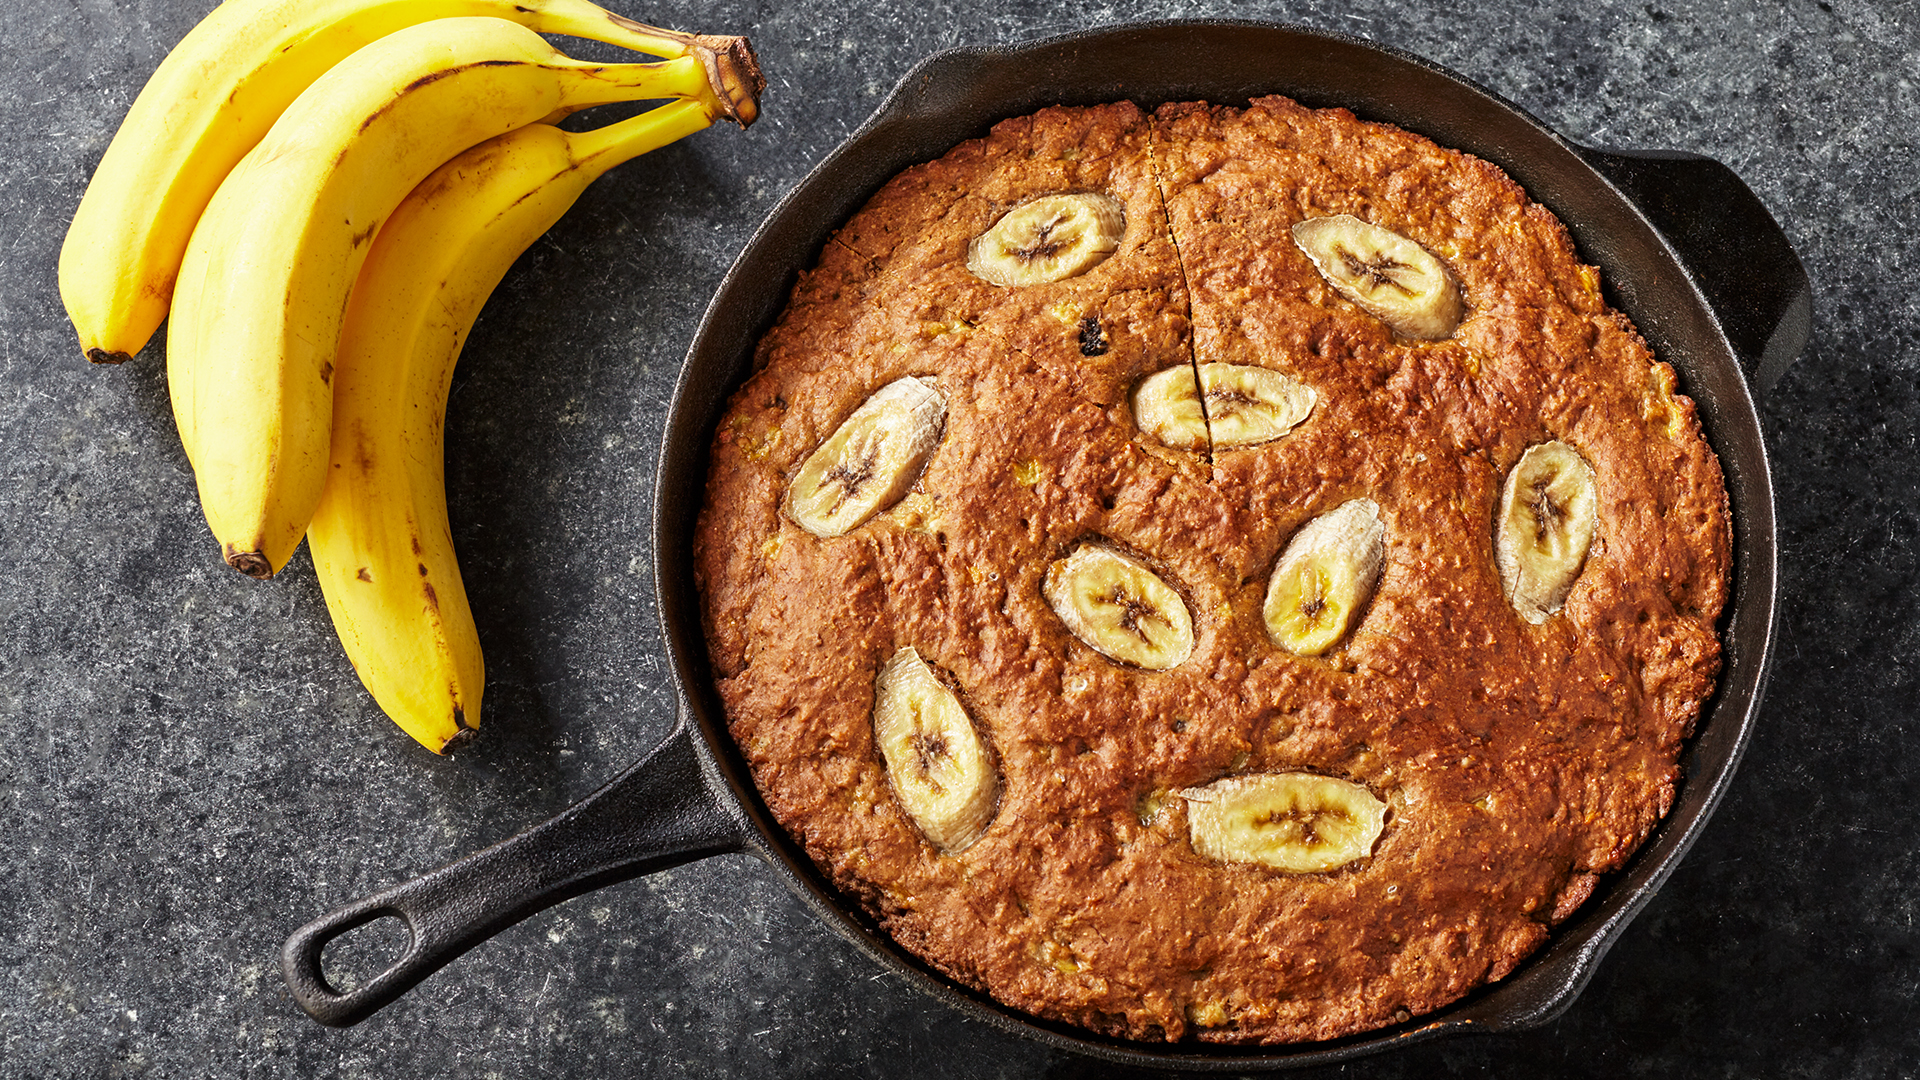 Brown Banana Skillet Bread Recipe